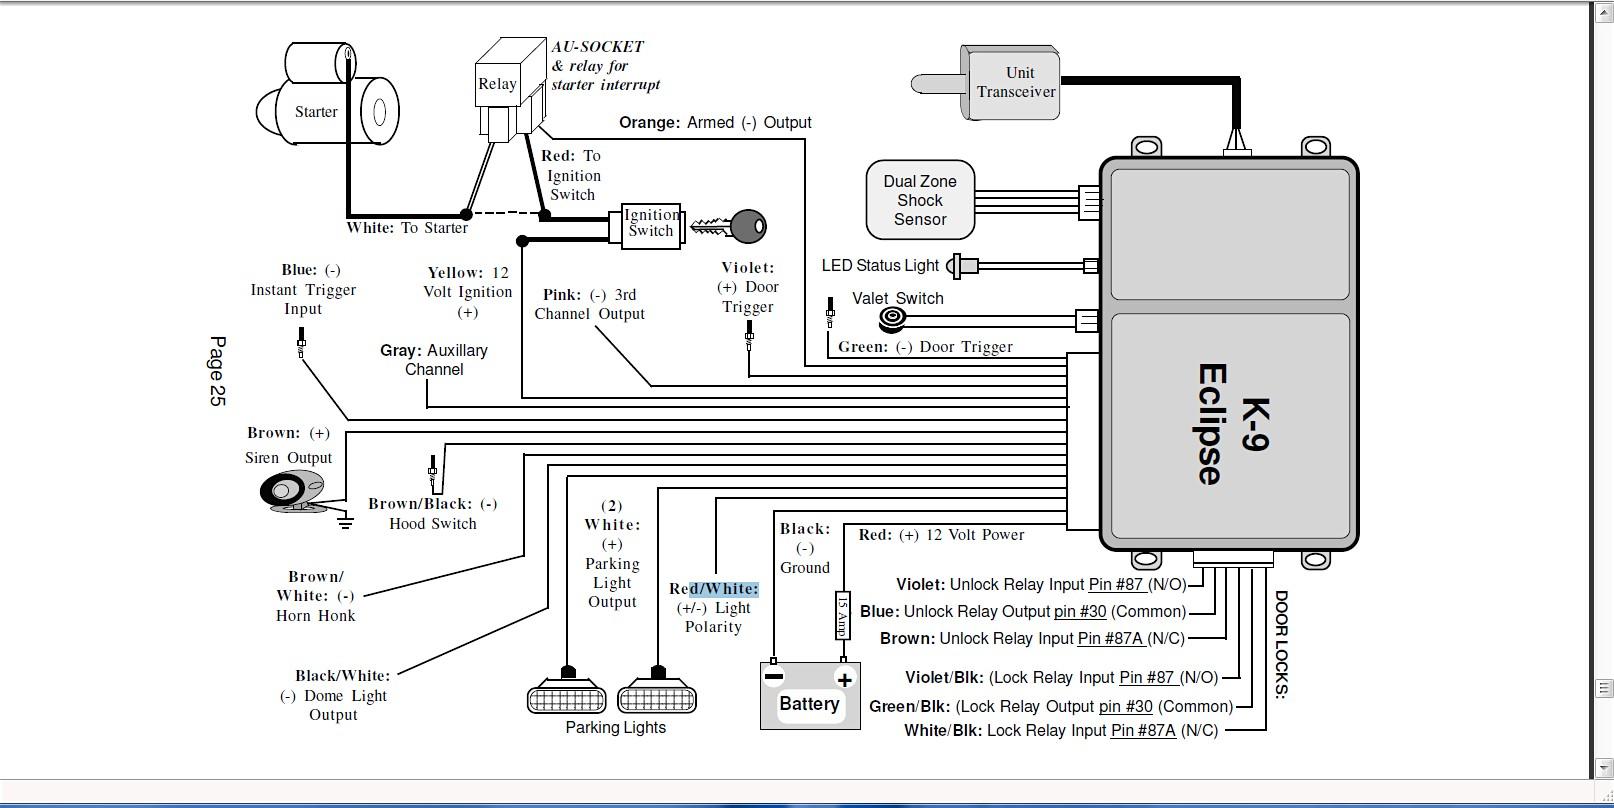 mando remote starter wiring diagram mando alarm wiring diagram earch car search giordon with example lines